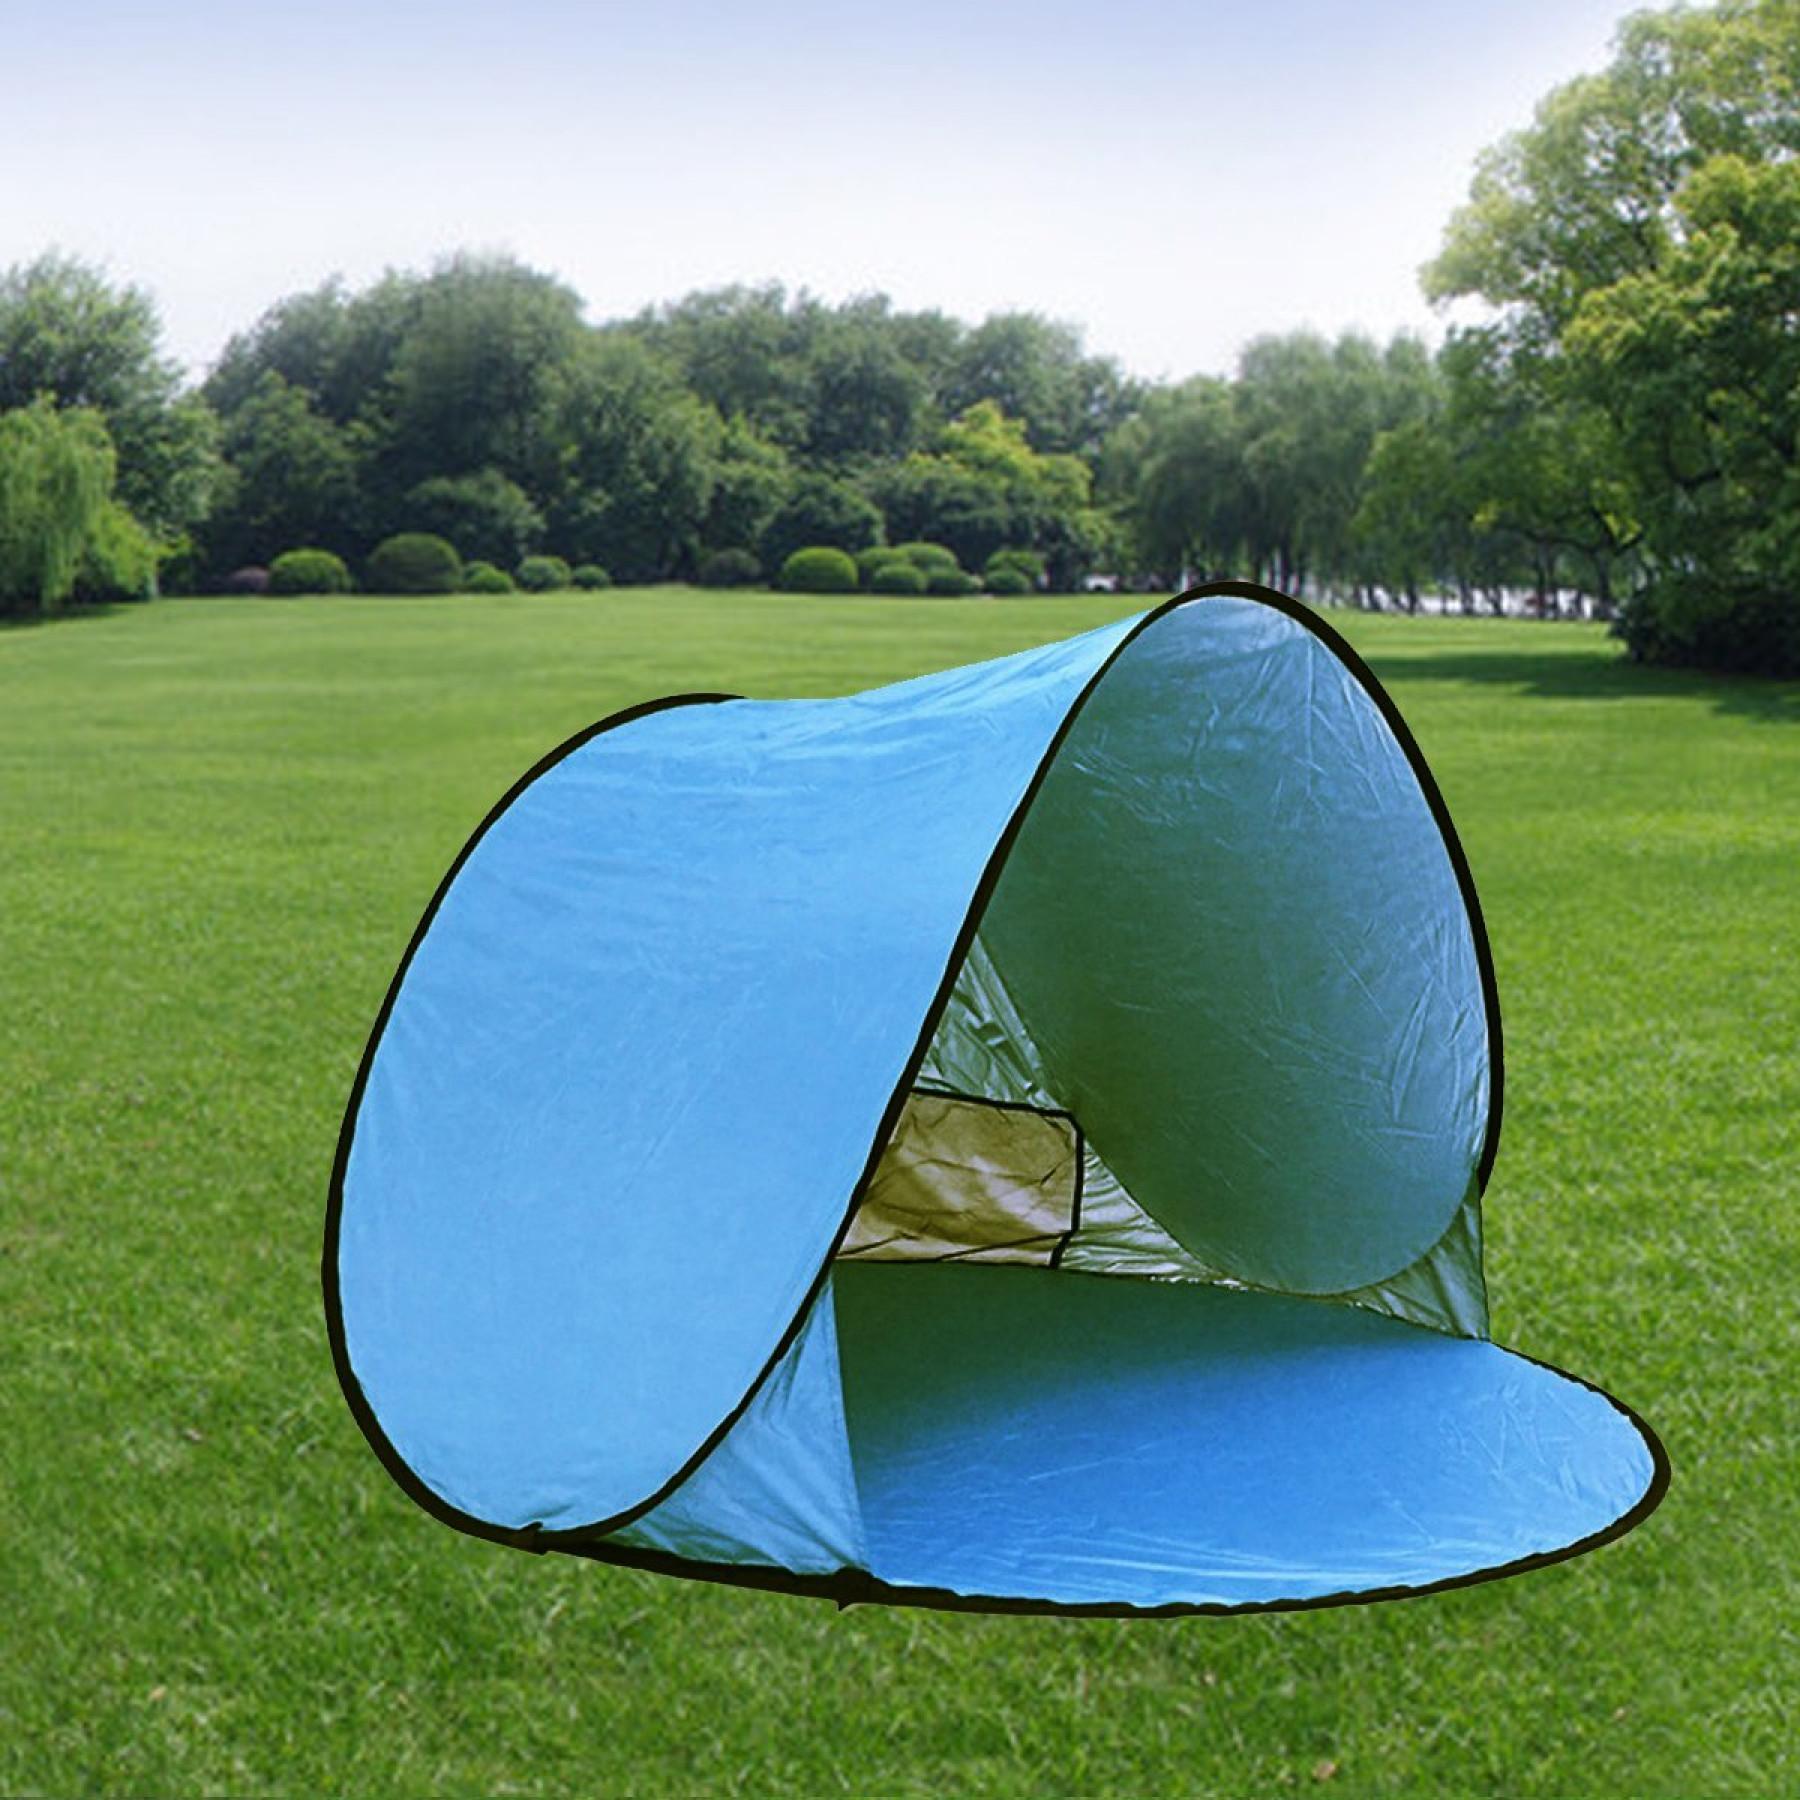 Cabana Portable Shelter : Automatic pop up beach tent portable lightweight sun